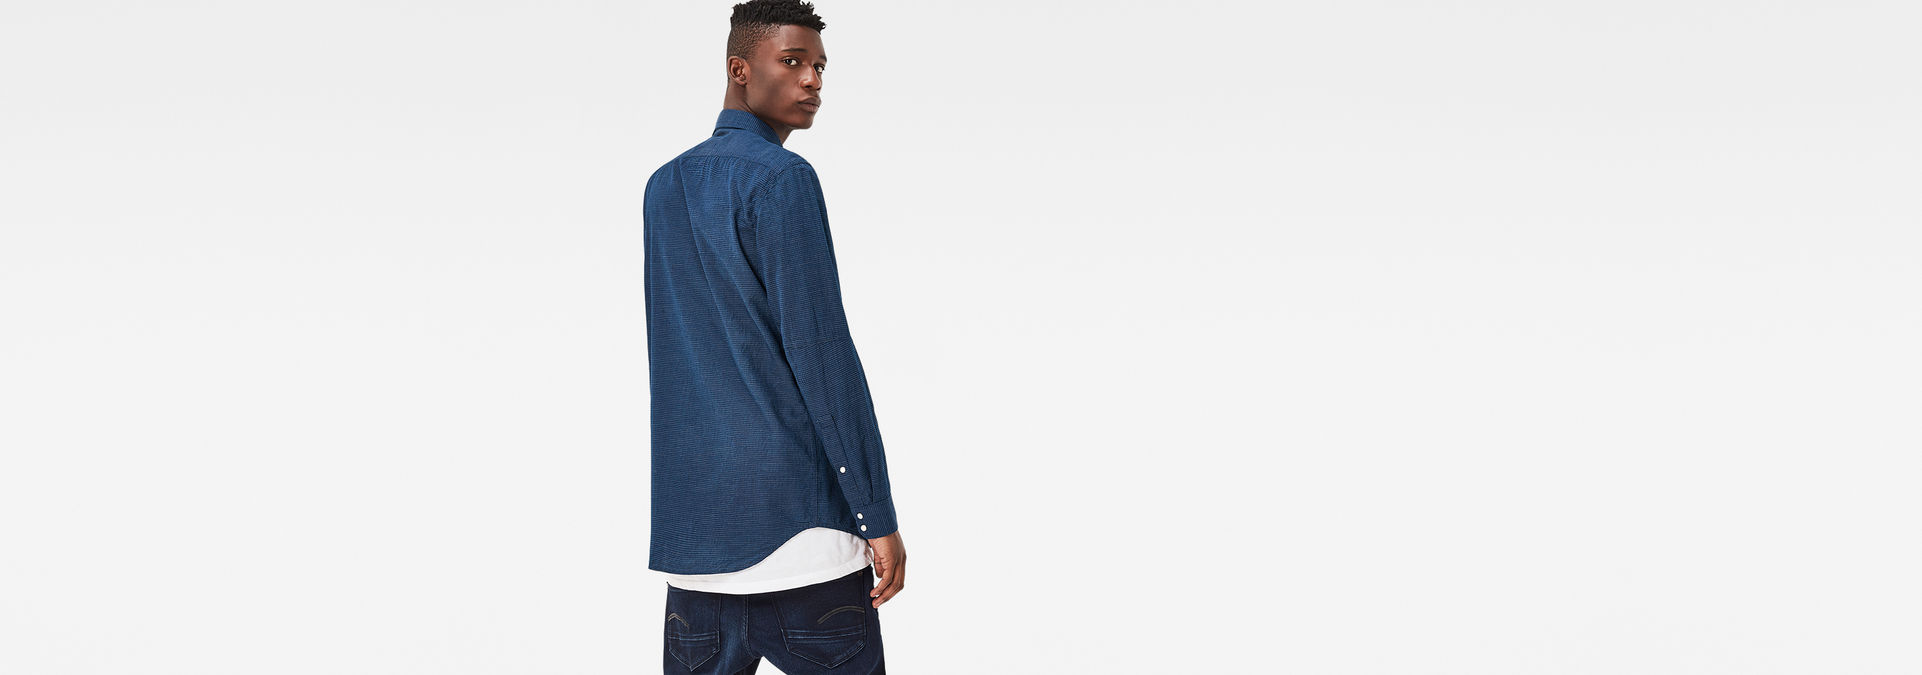 6f47070f5 ... G-Star RAW® Stalt Clean Denim Shirt Dark blue ...